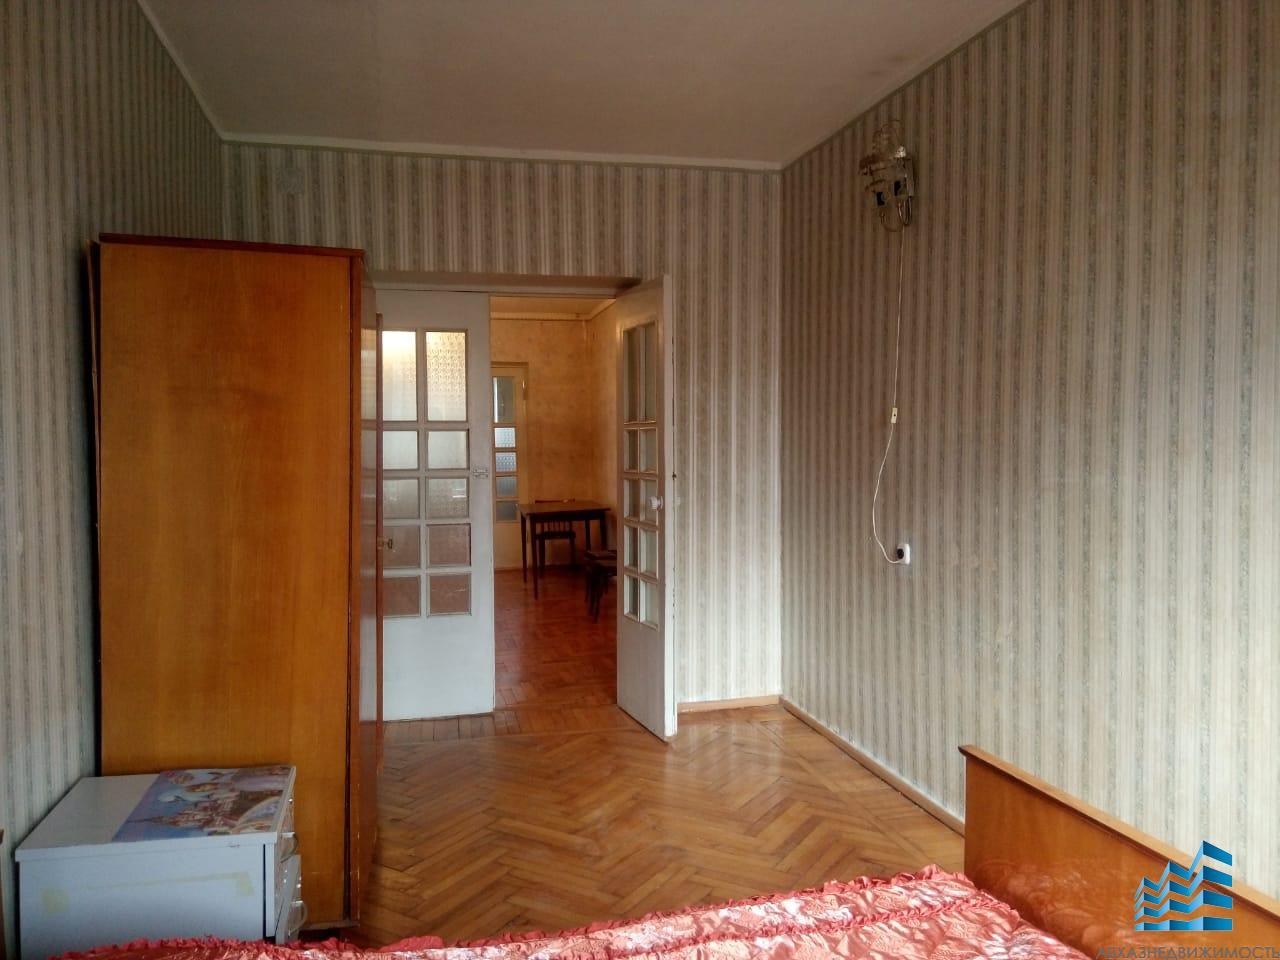 Жилая 2-комнатная квартира за 1 100 000 руб